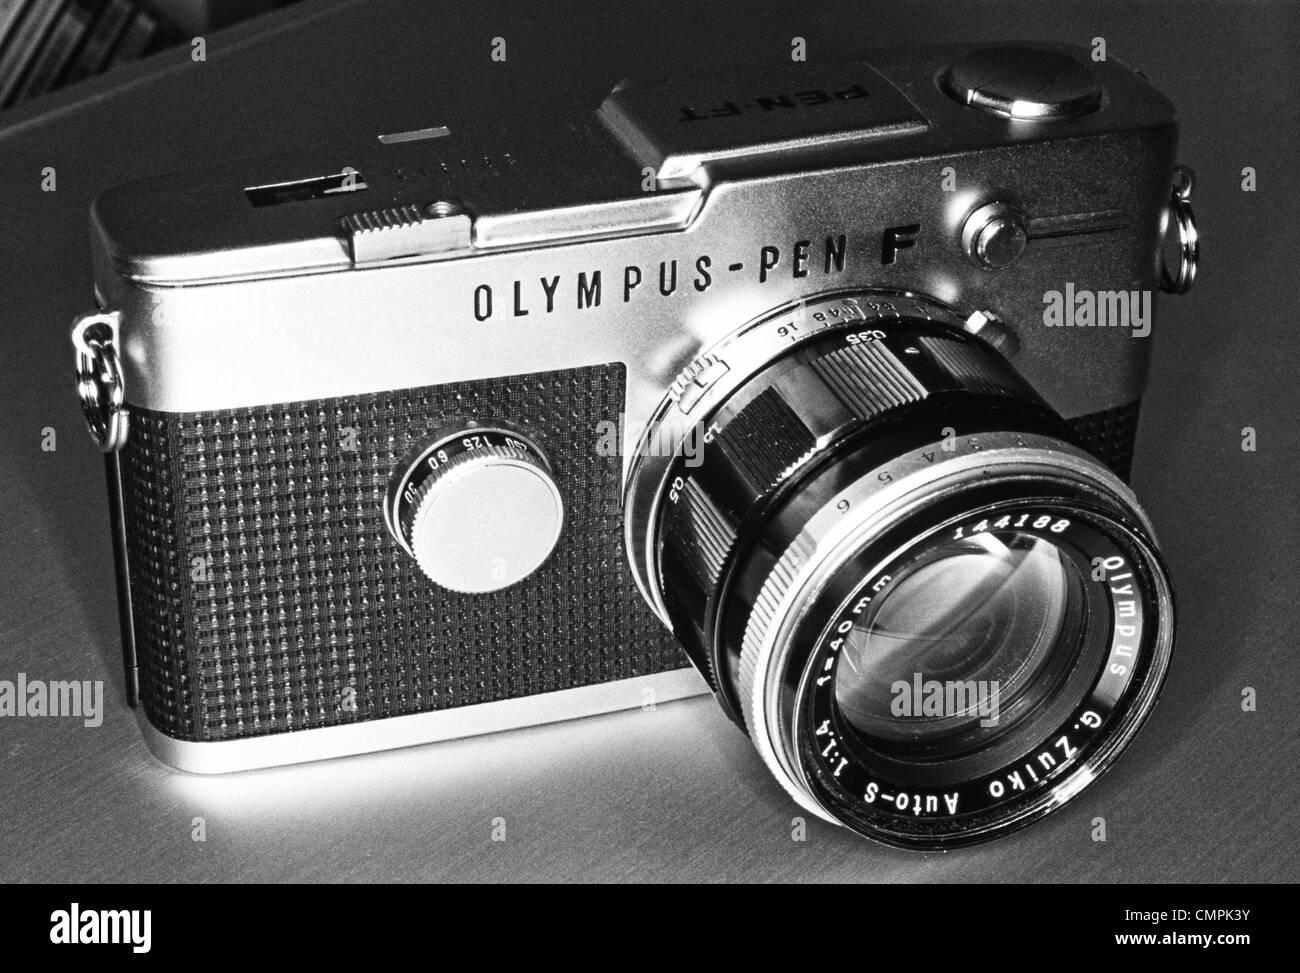 Olympus - Pen FT - Stock Image